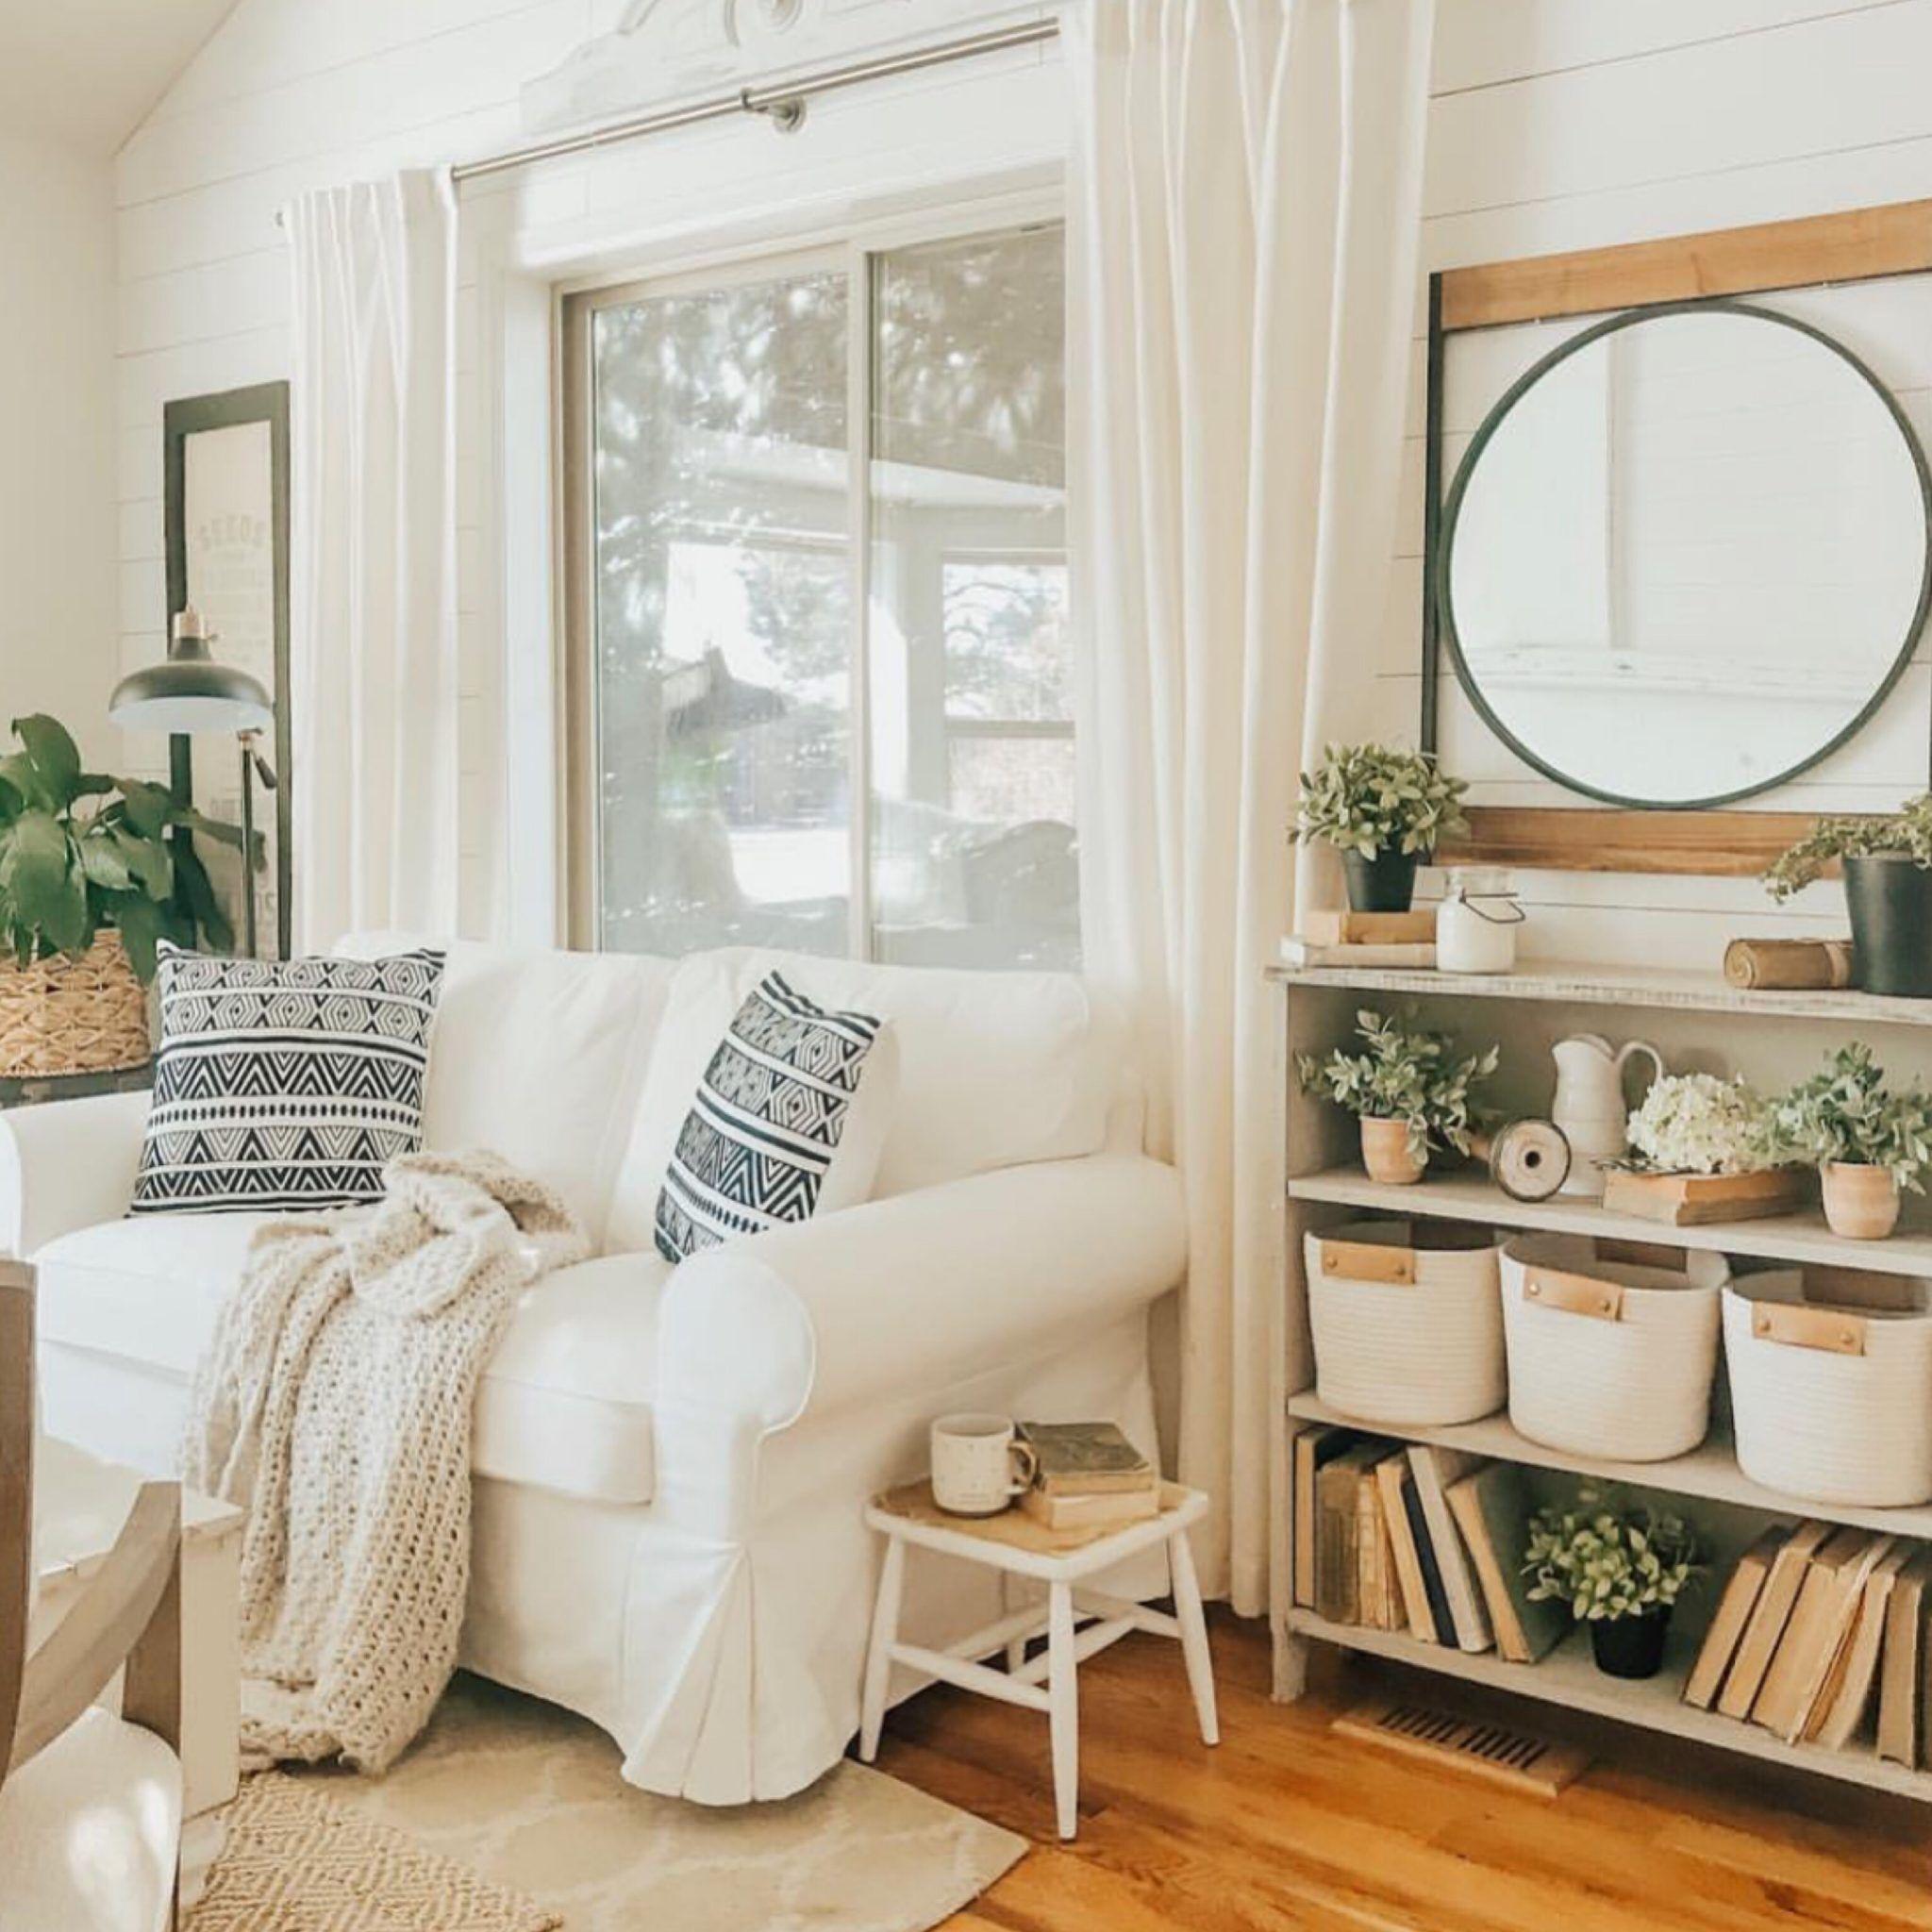 40 of the BEST Home Decor Blogs/Instagram Interior Design ...